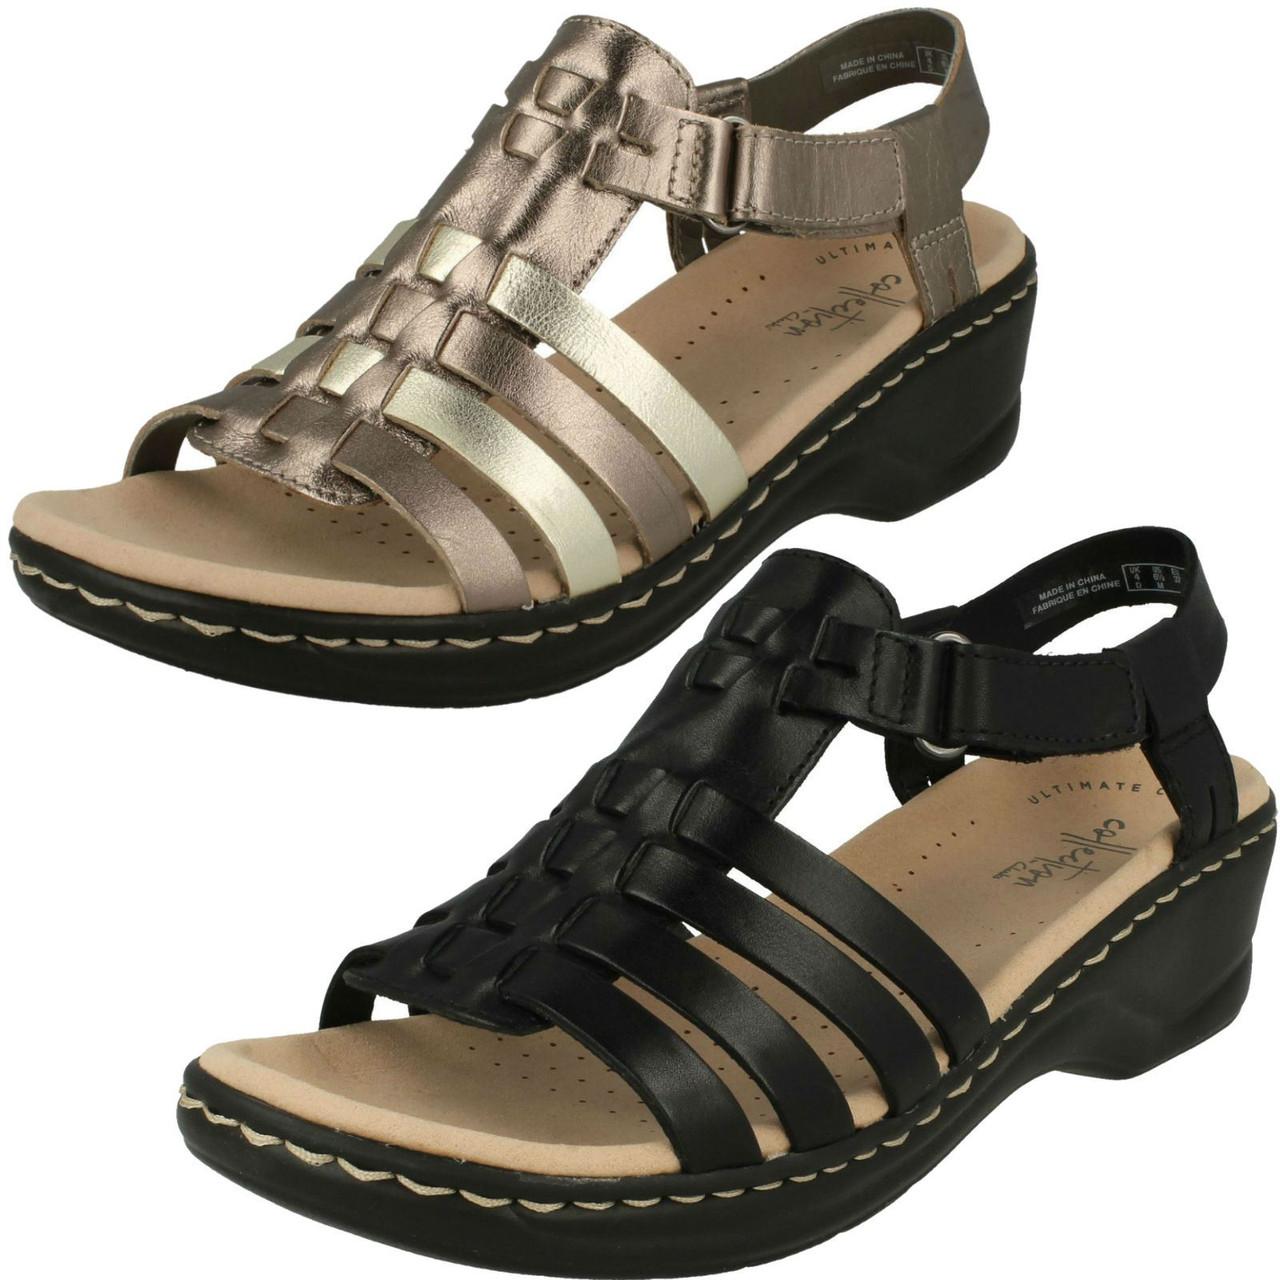 Ladies Clarks Gladiator Style Sandals